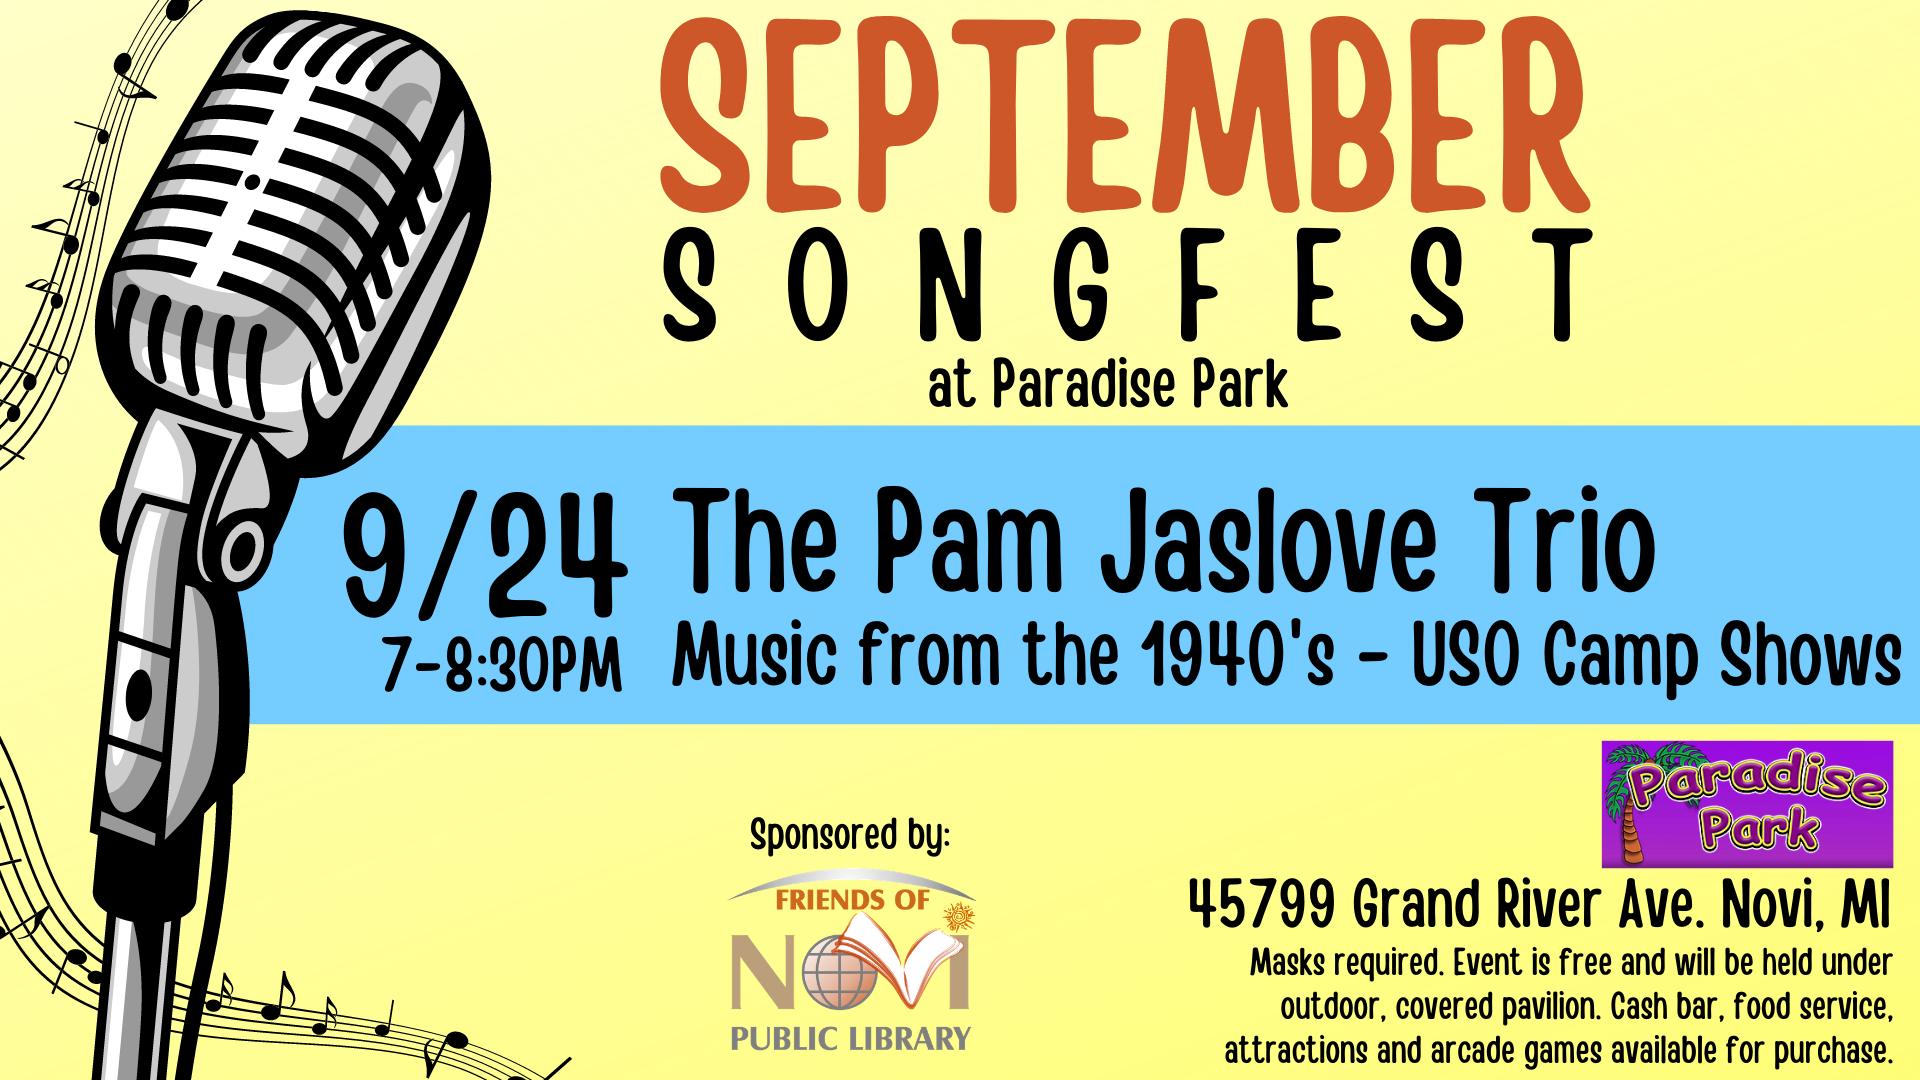 September Songfest - The Pam Jaslove Trio